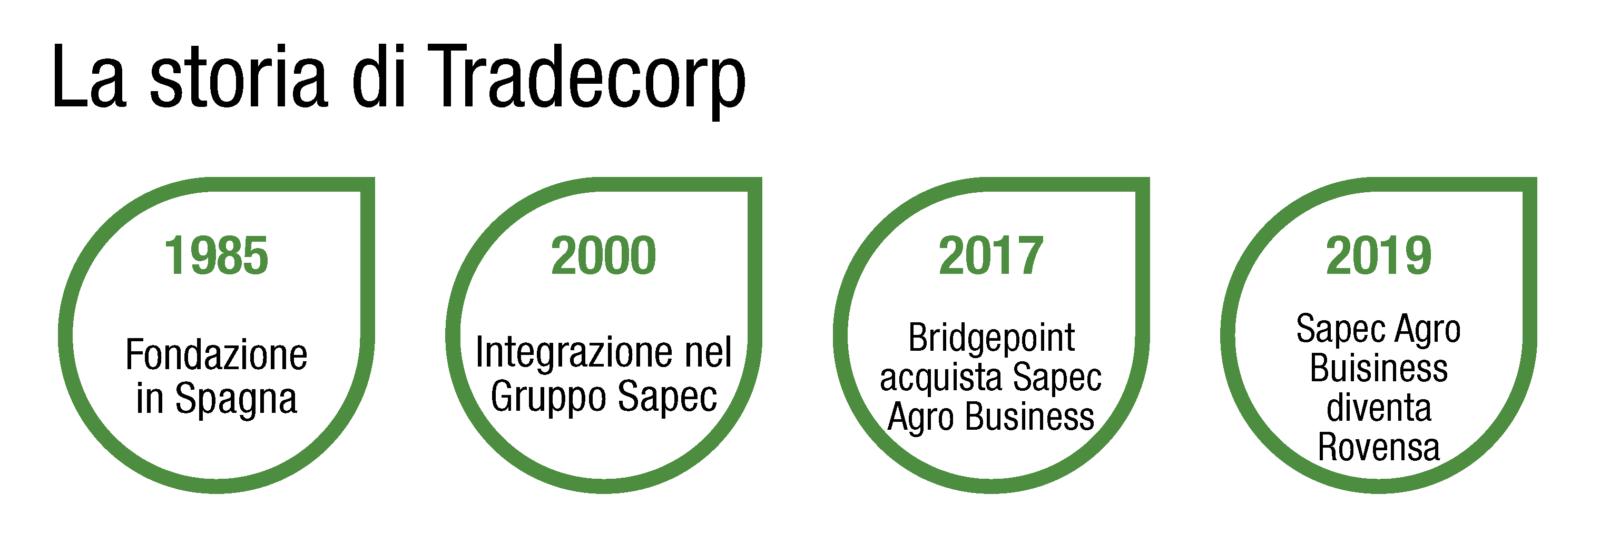 Storia Tradecorp